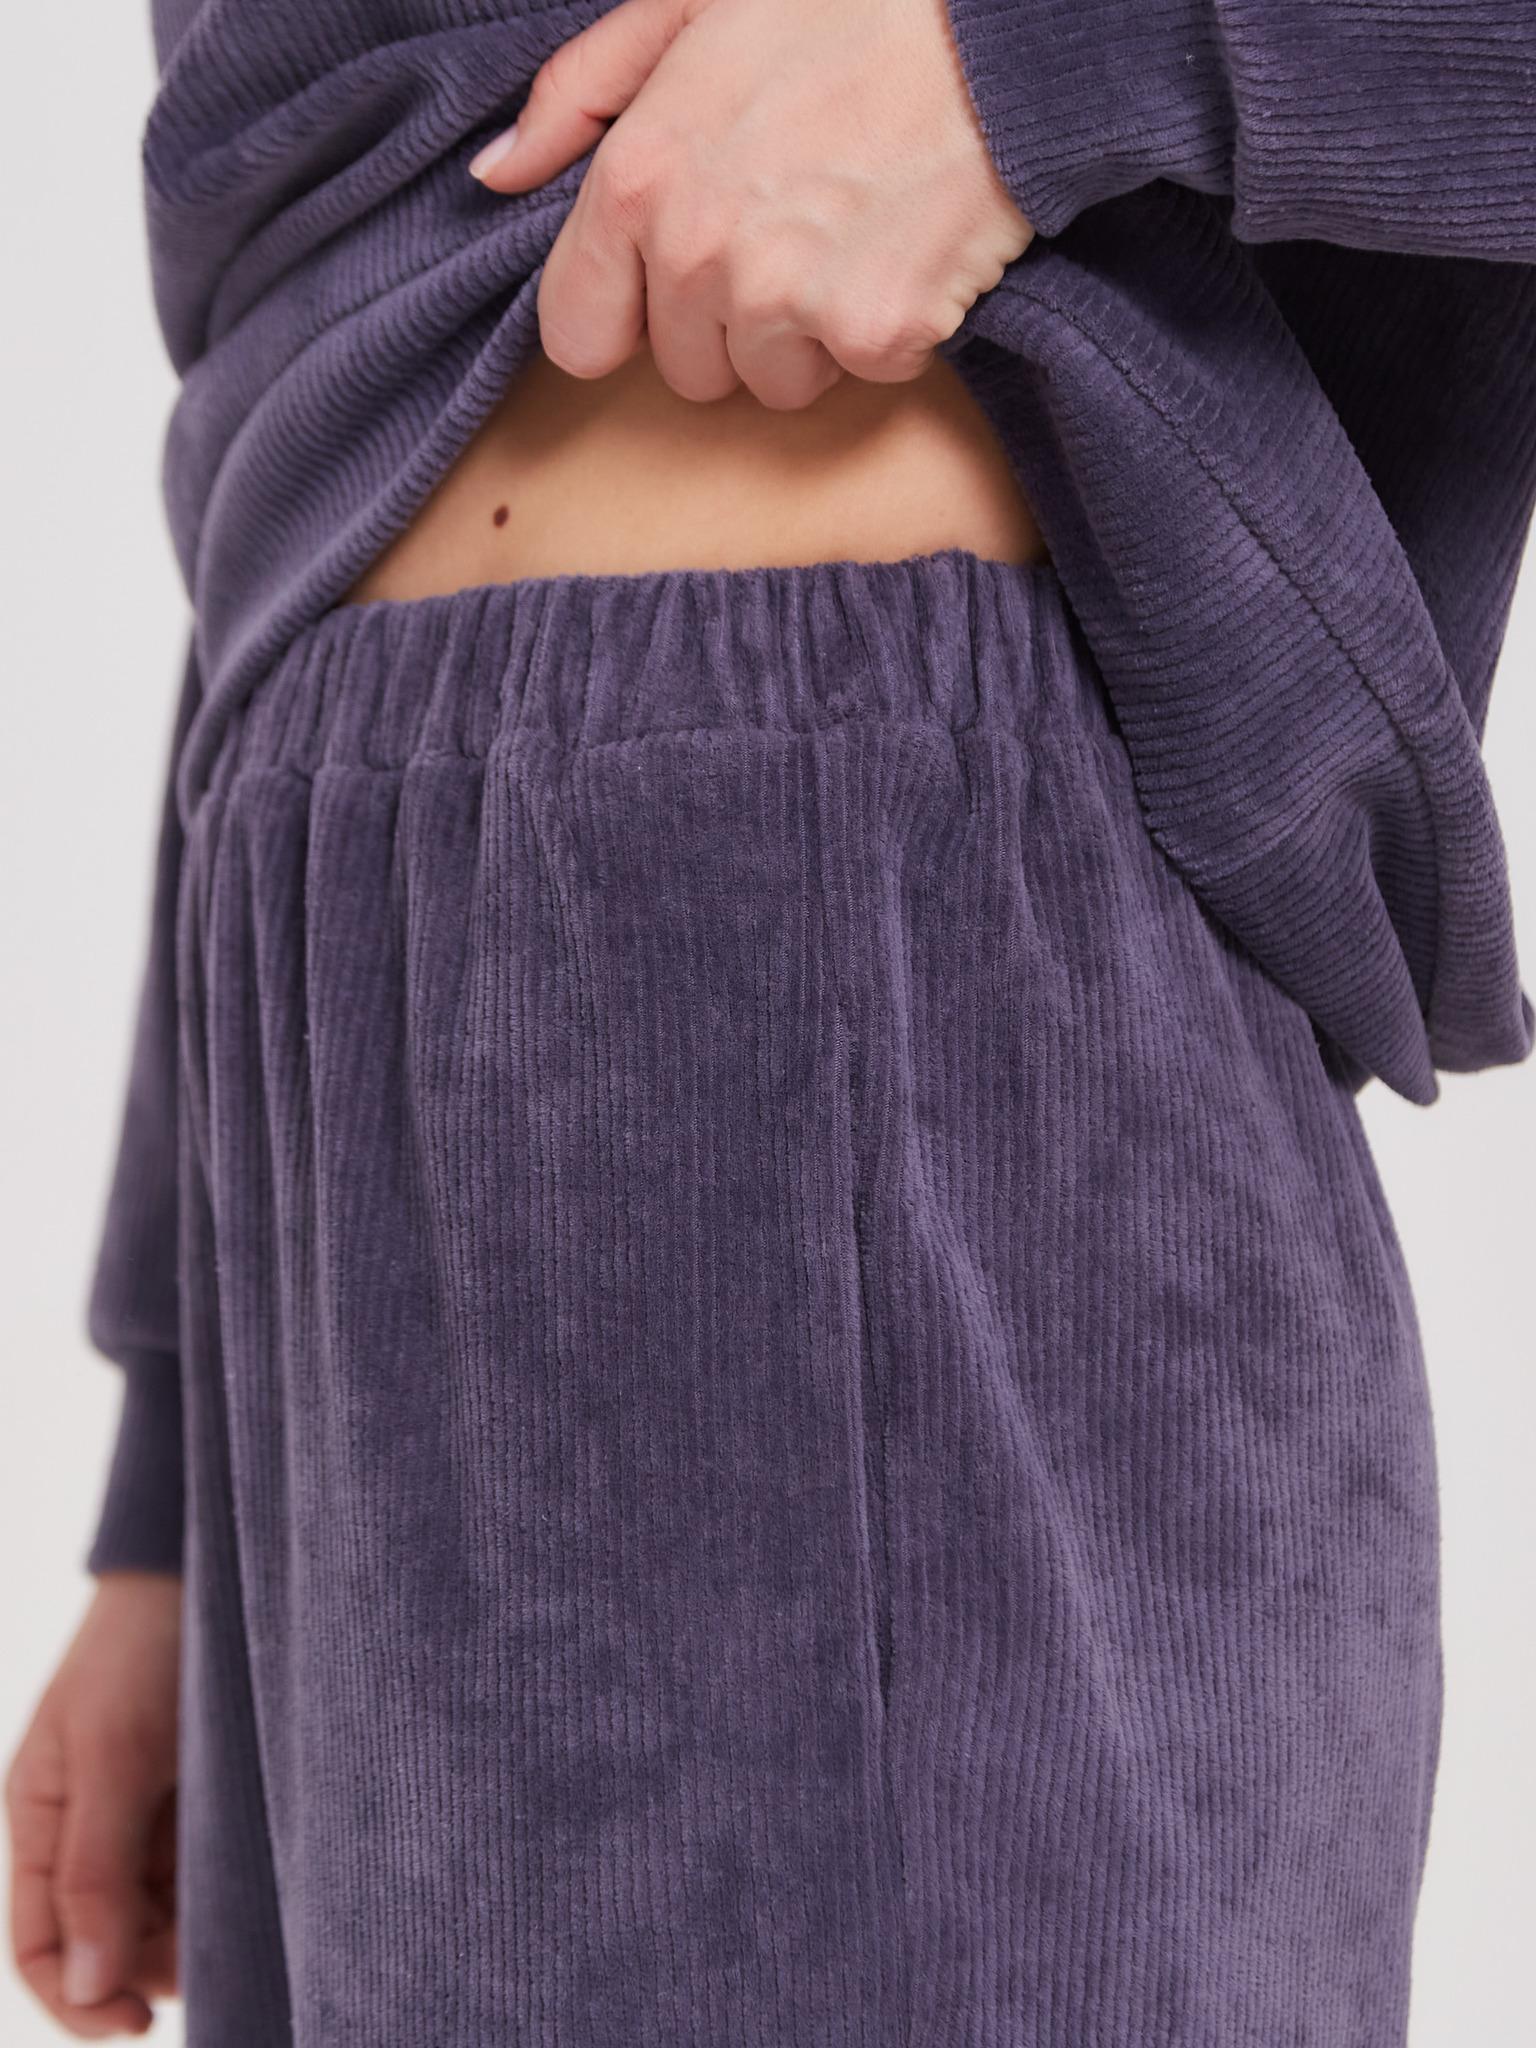 Женский костюм Brandmania из вельвета (свитшот, юбка, брюки)